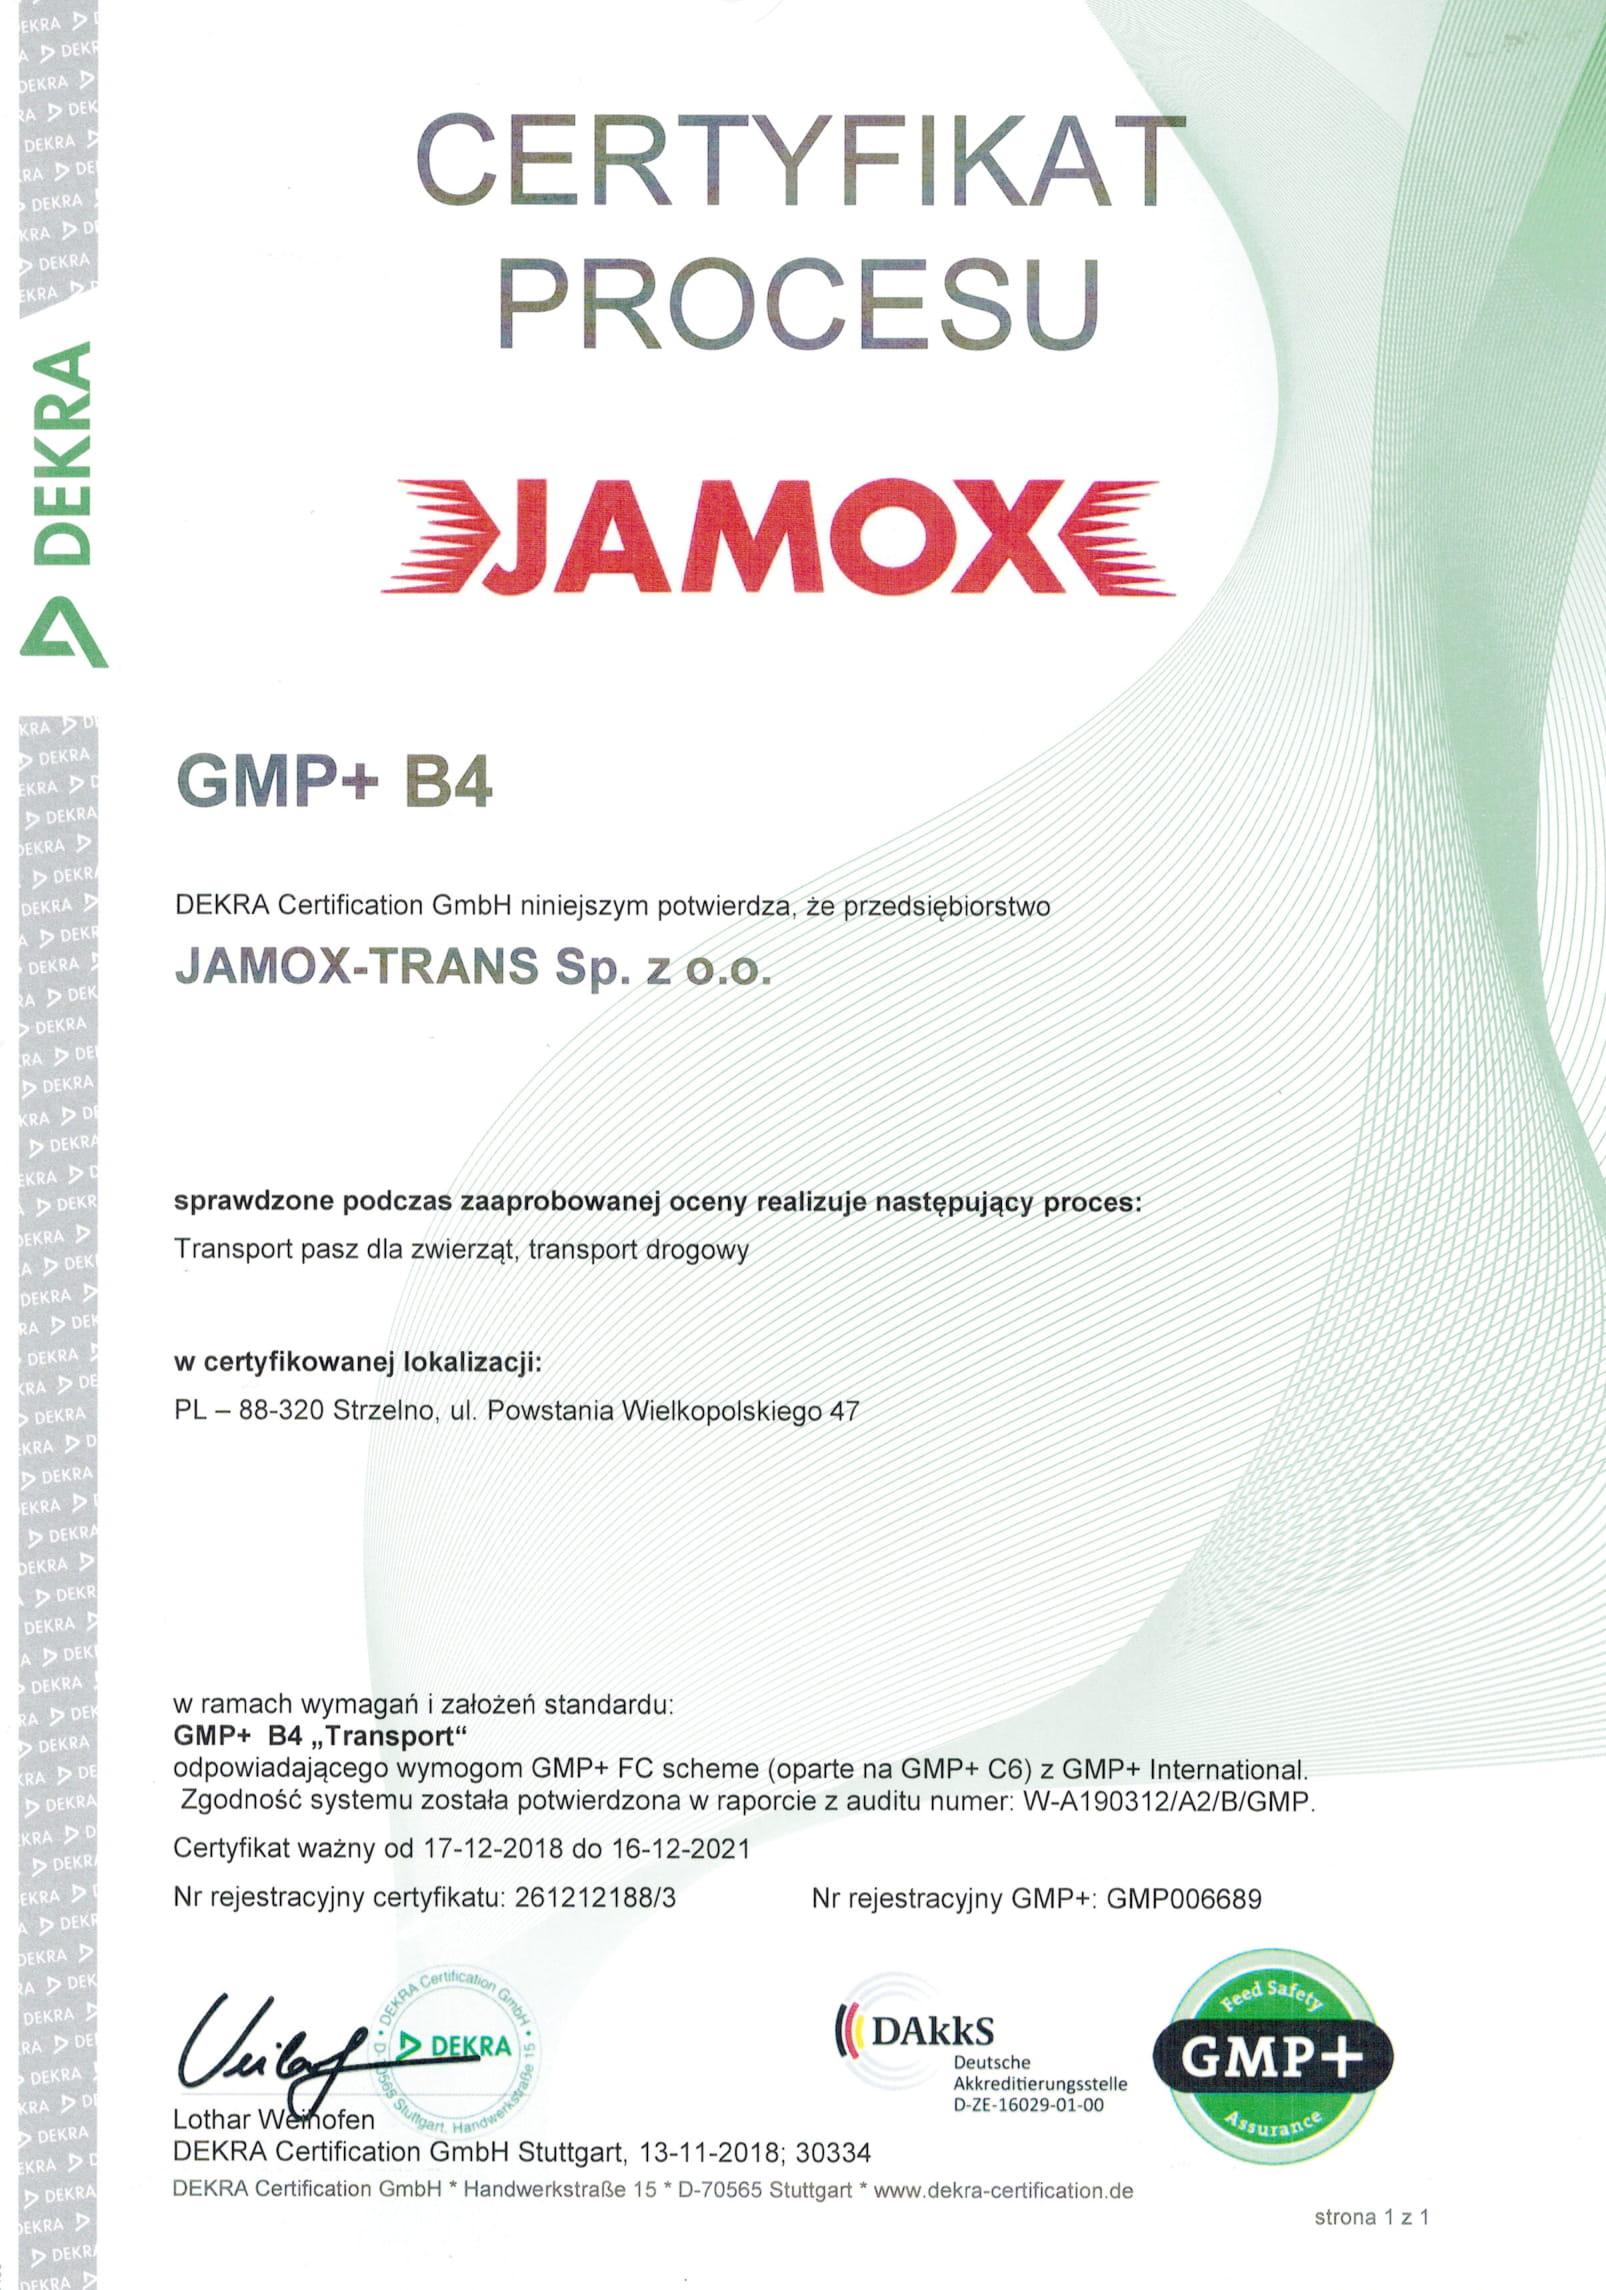 http://jamox.eu/wp-content/uploads/2020/12/c.jpg